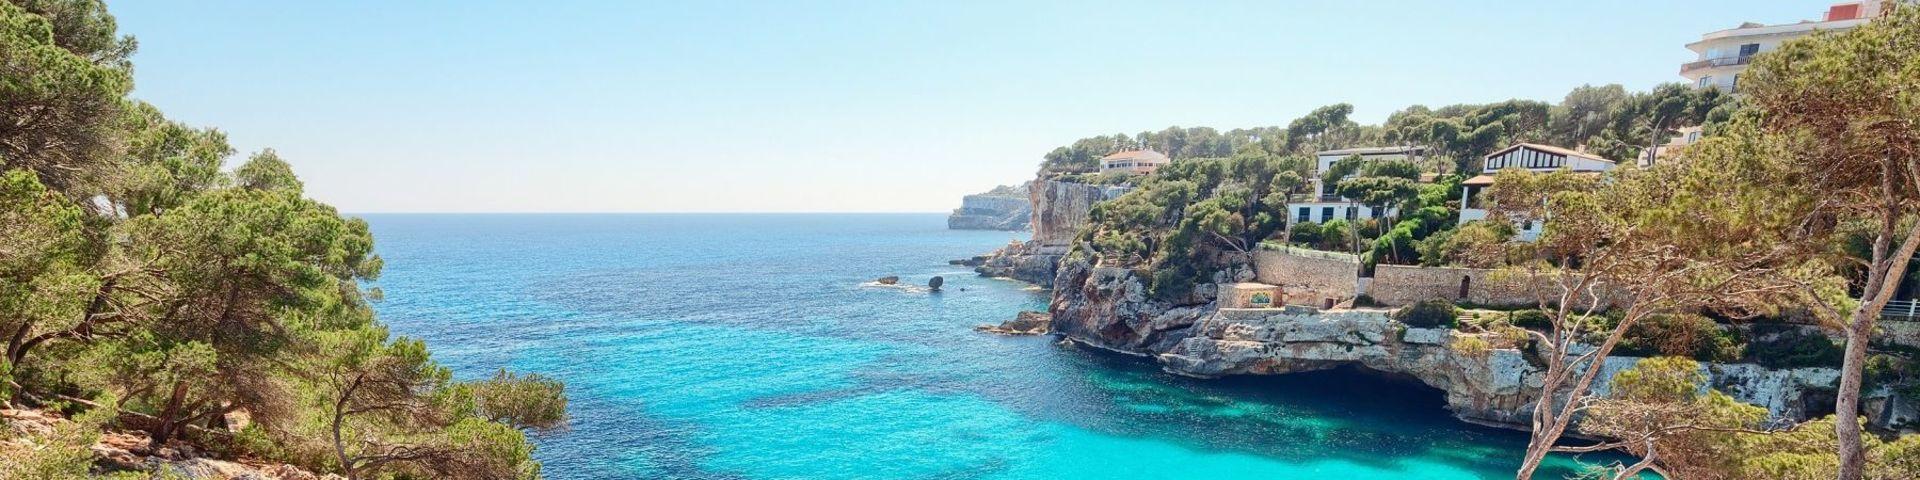 Sorglos nach Mallorca!